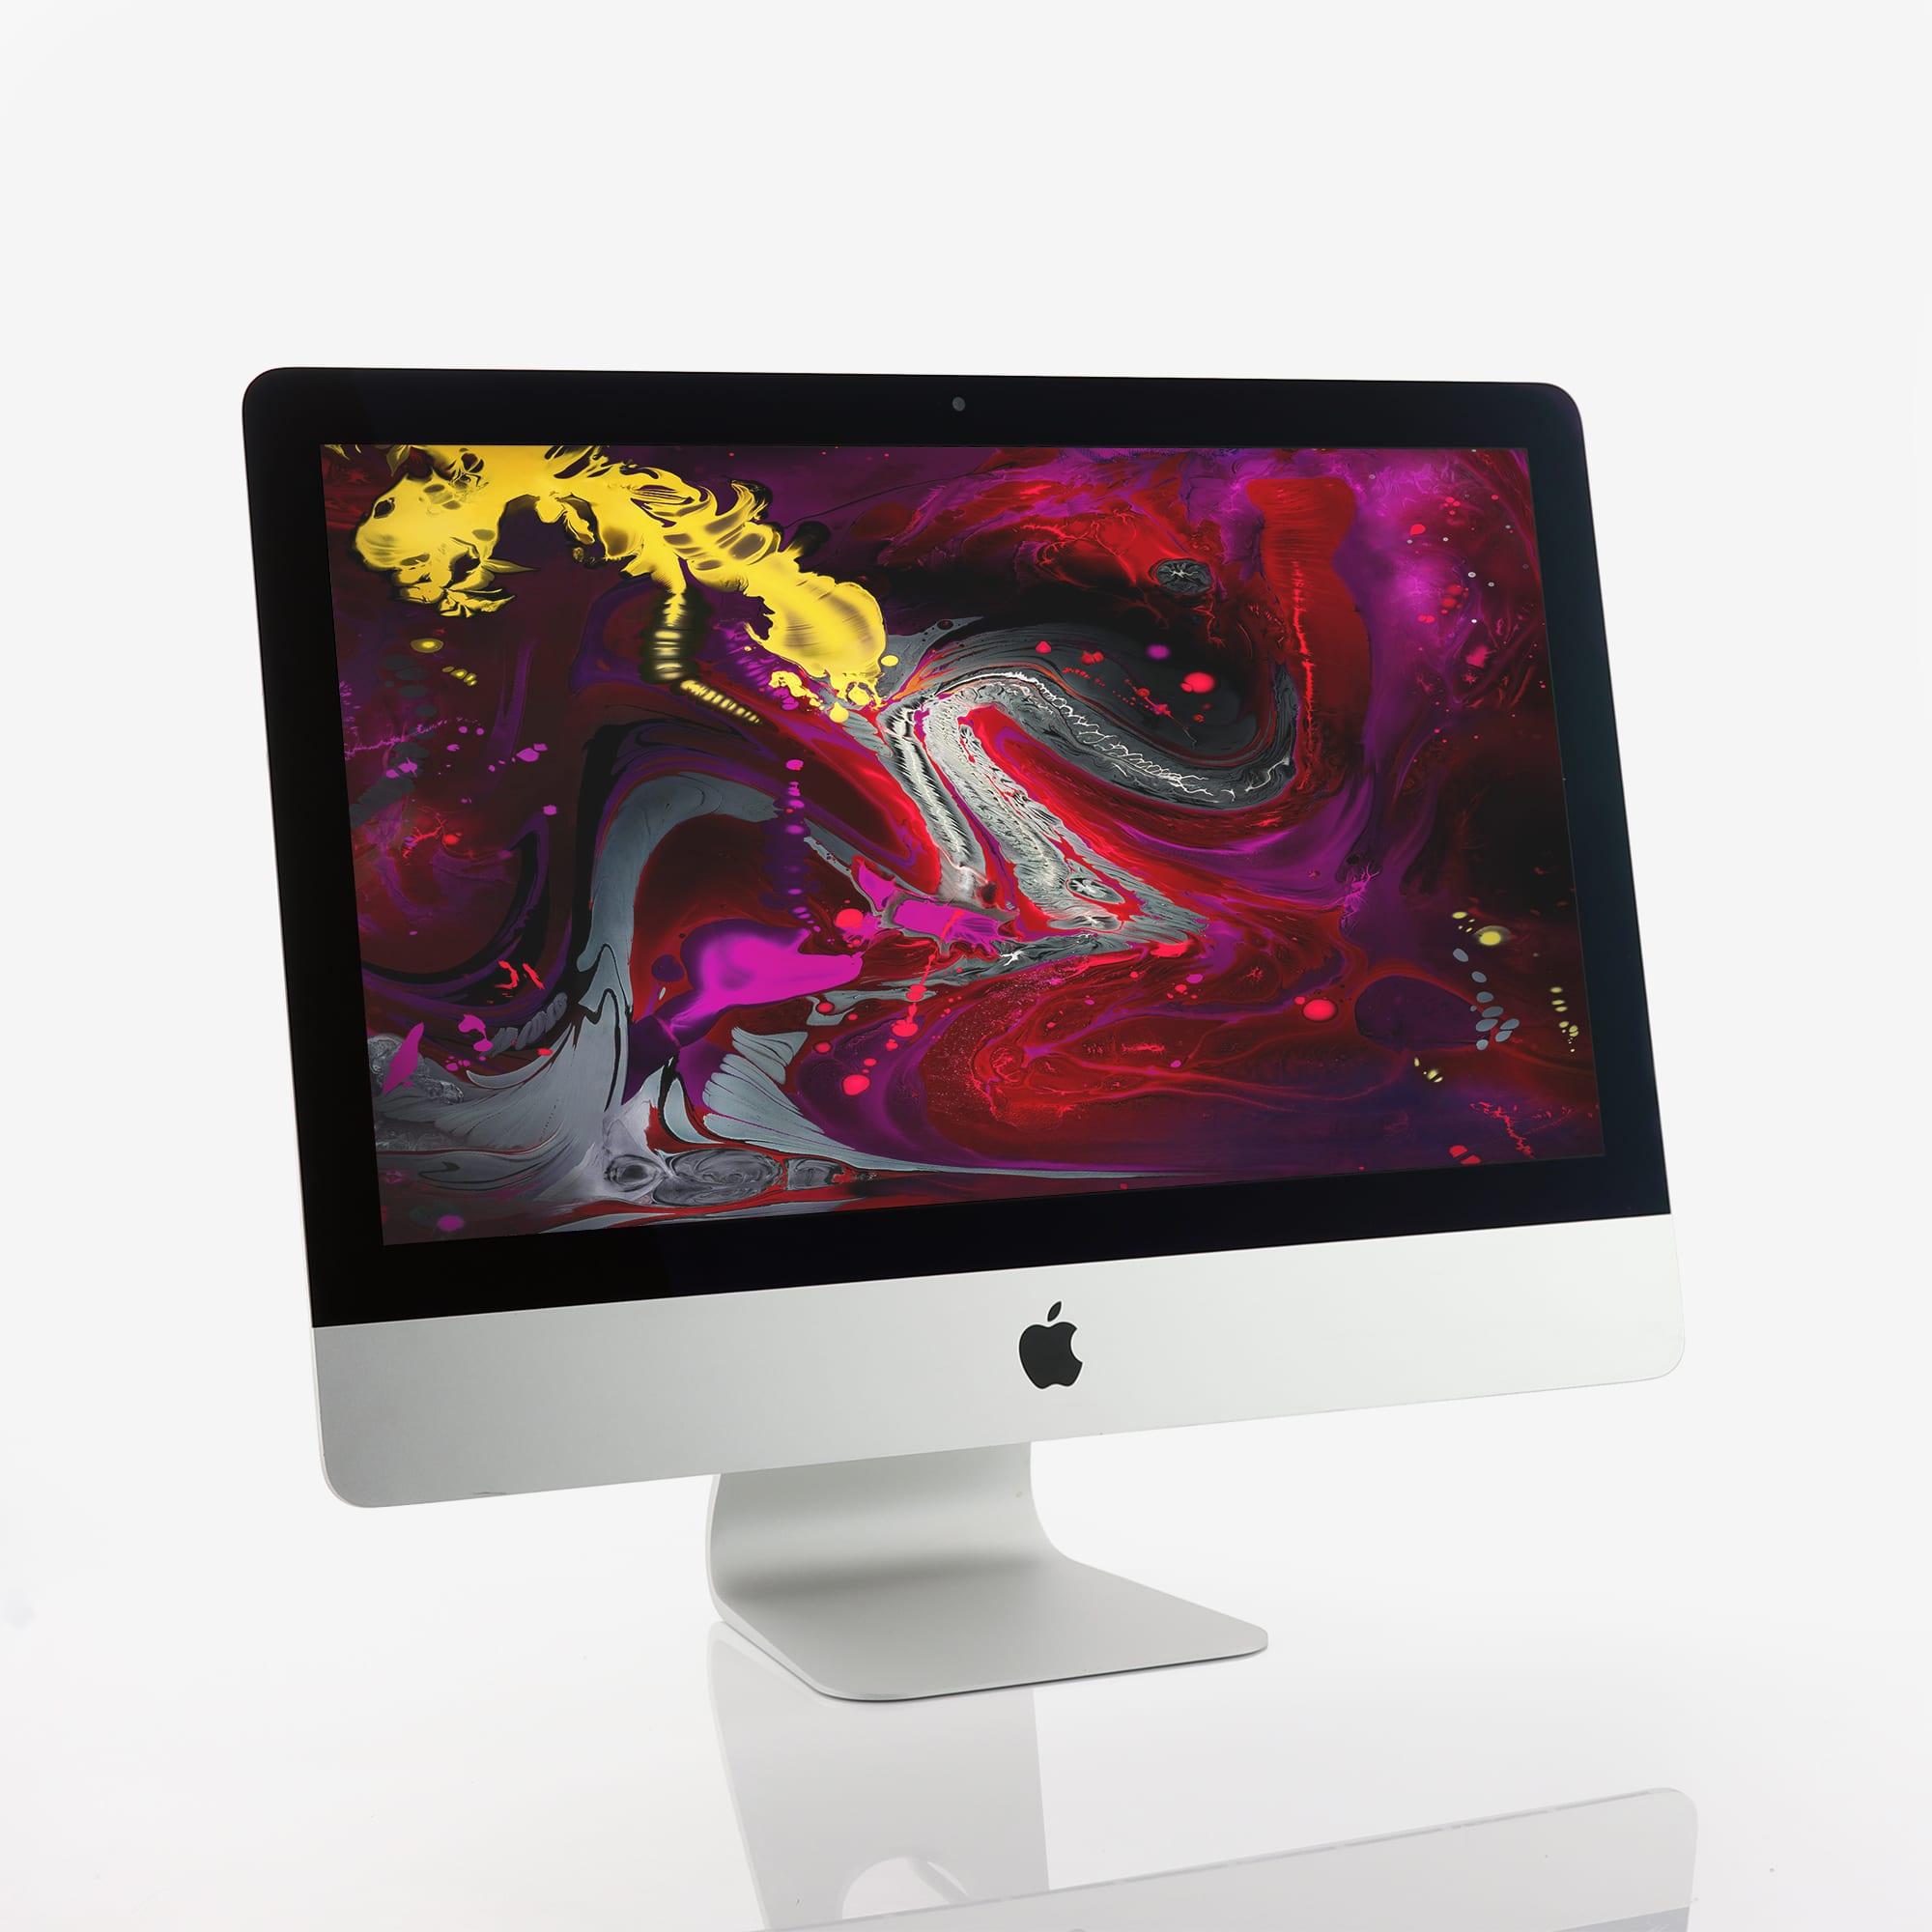 1 x Apple iMac Slim 21.5 Inch Intel Core i5 2.70 GHz (2012)